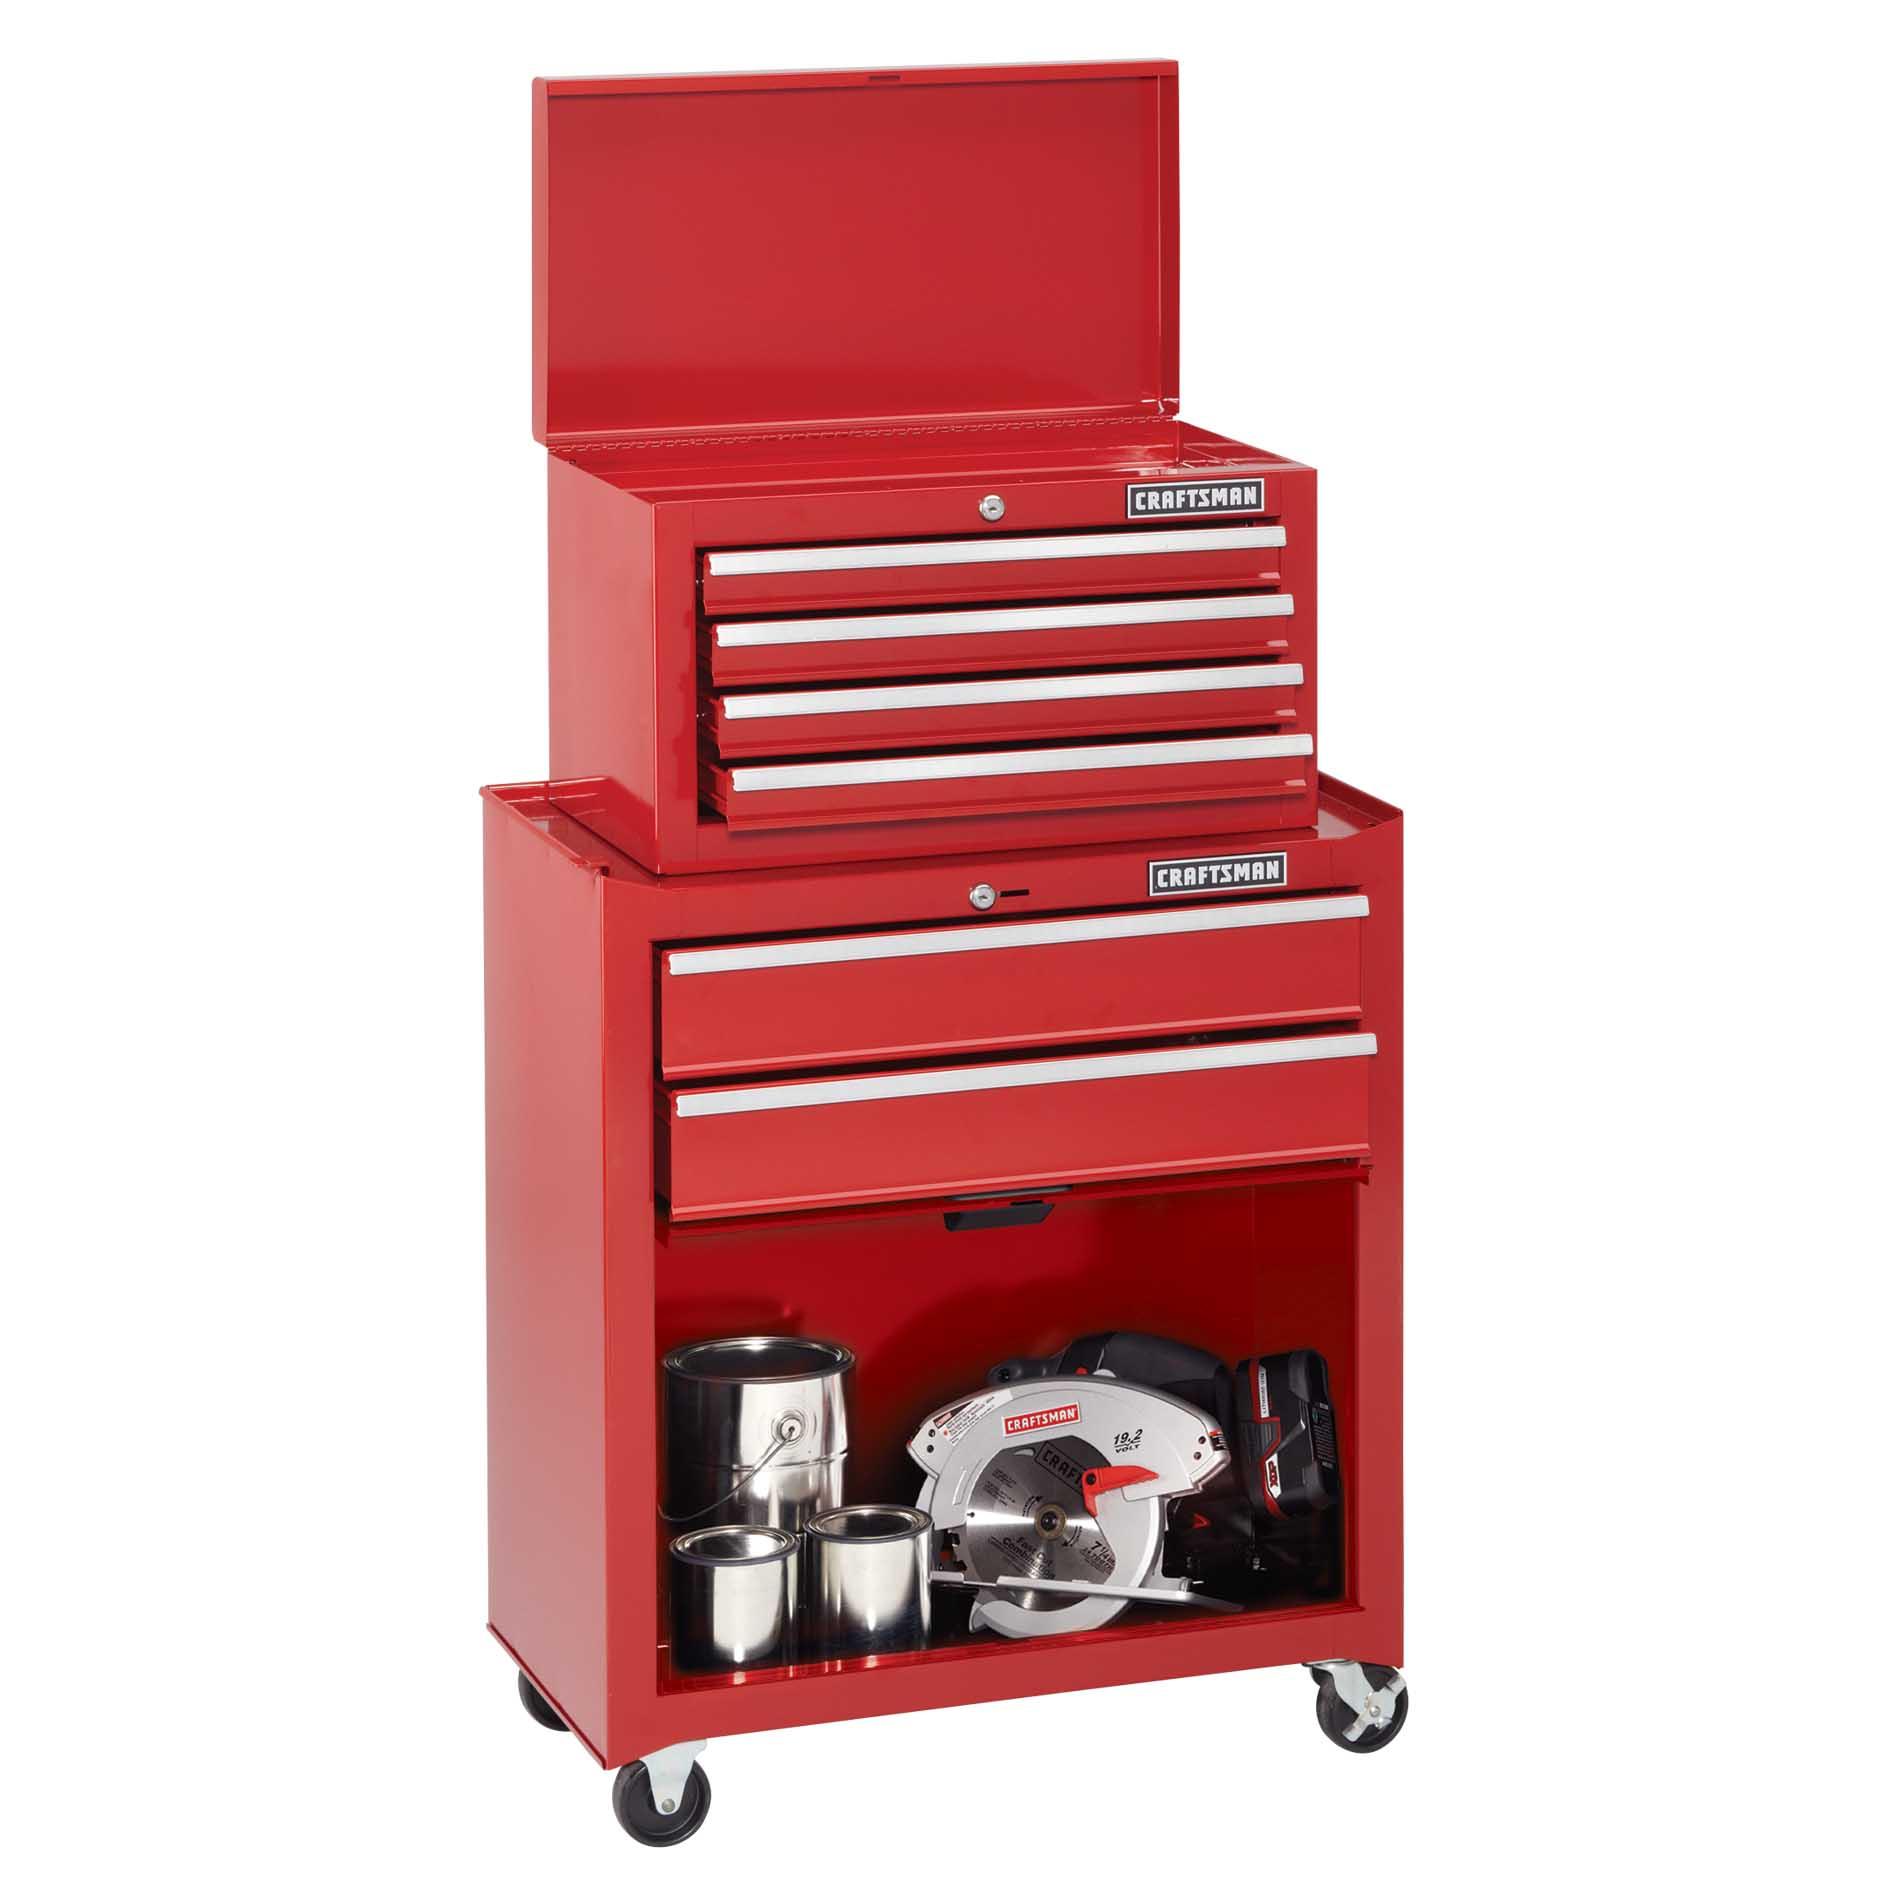 Craftsman Home Series 6-Drawer Tool Center with Bulk Storage Panel Door